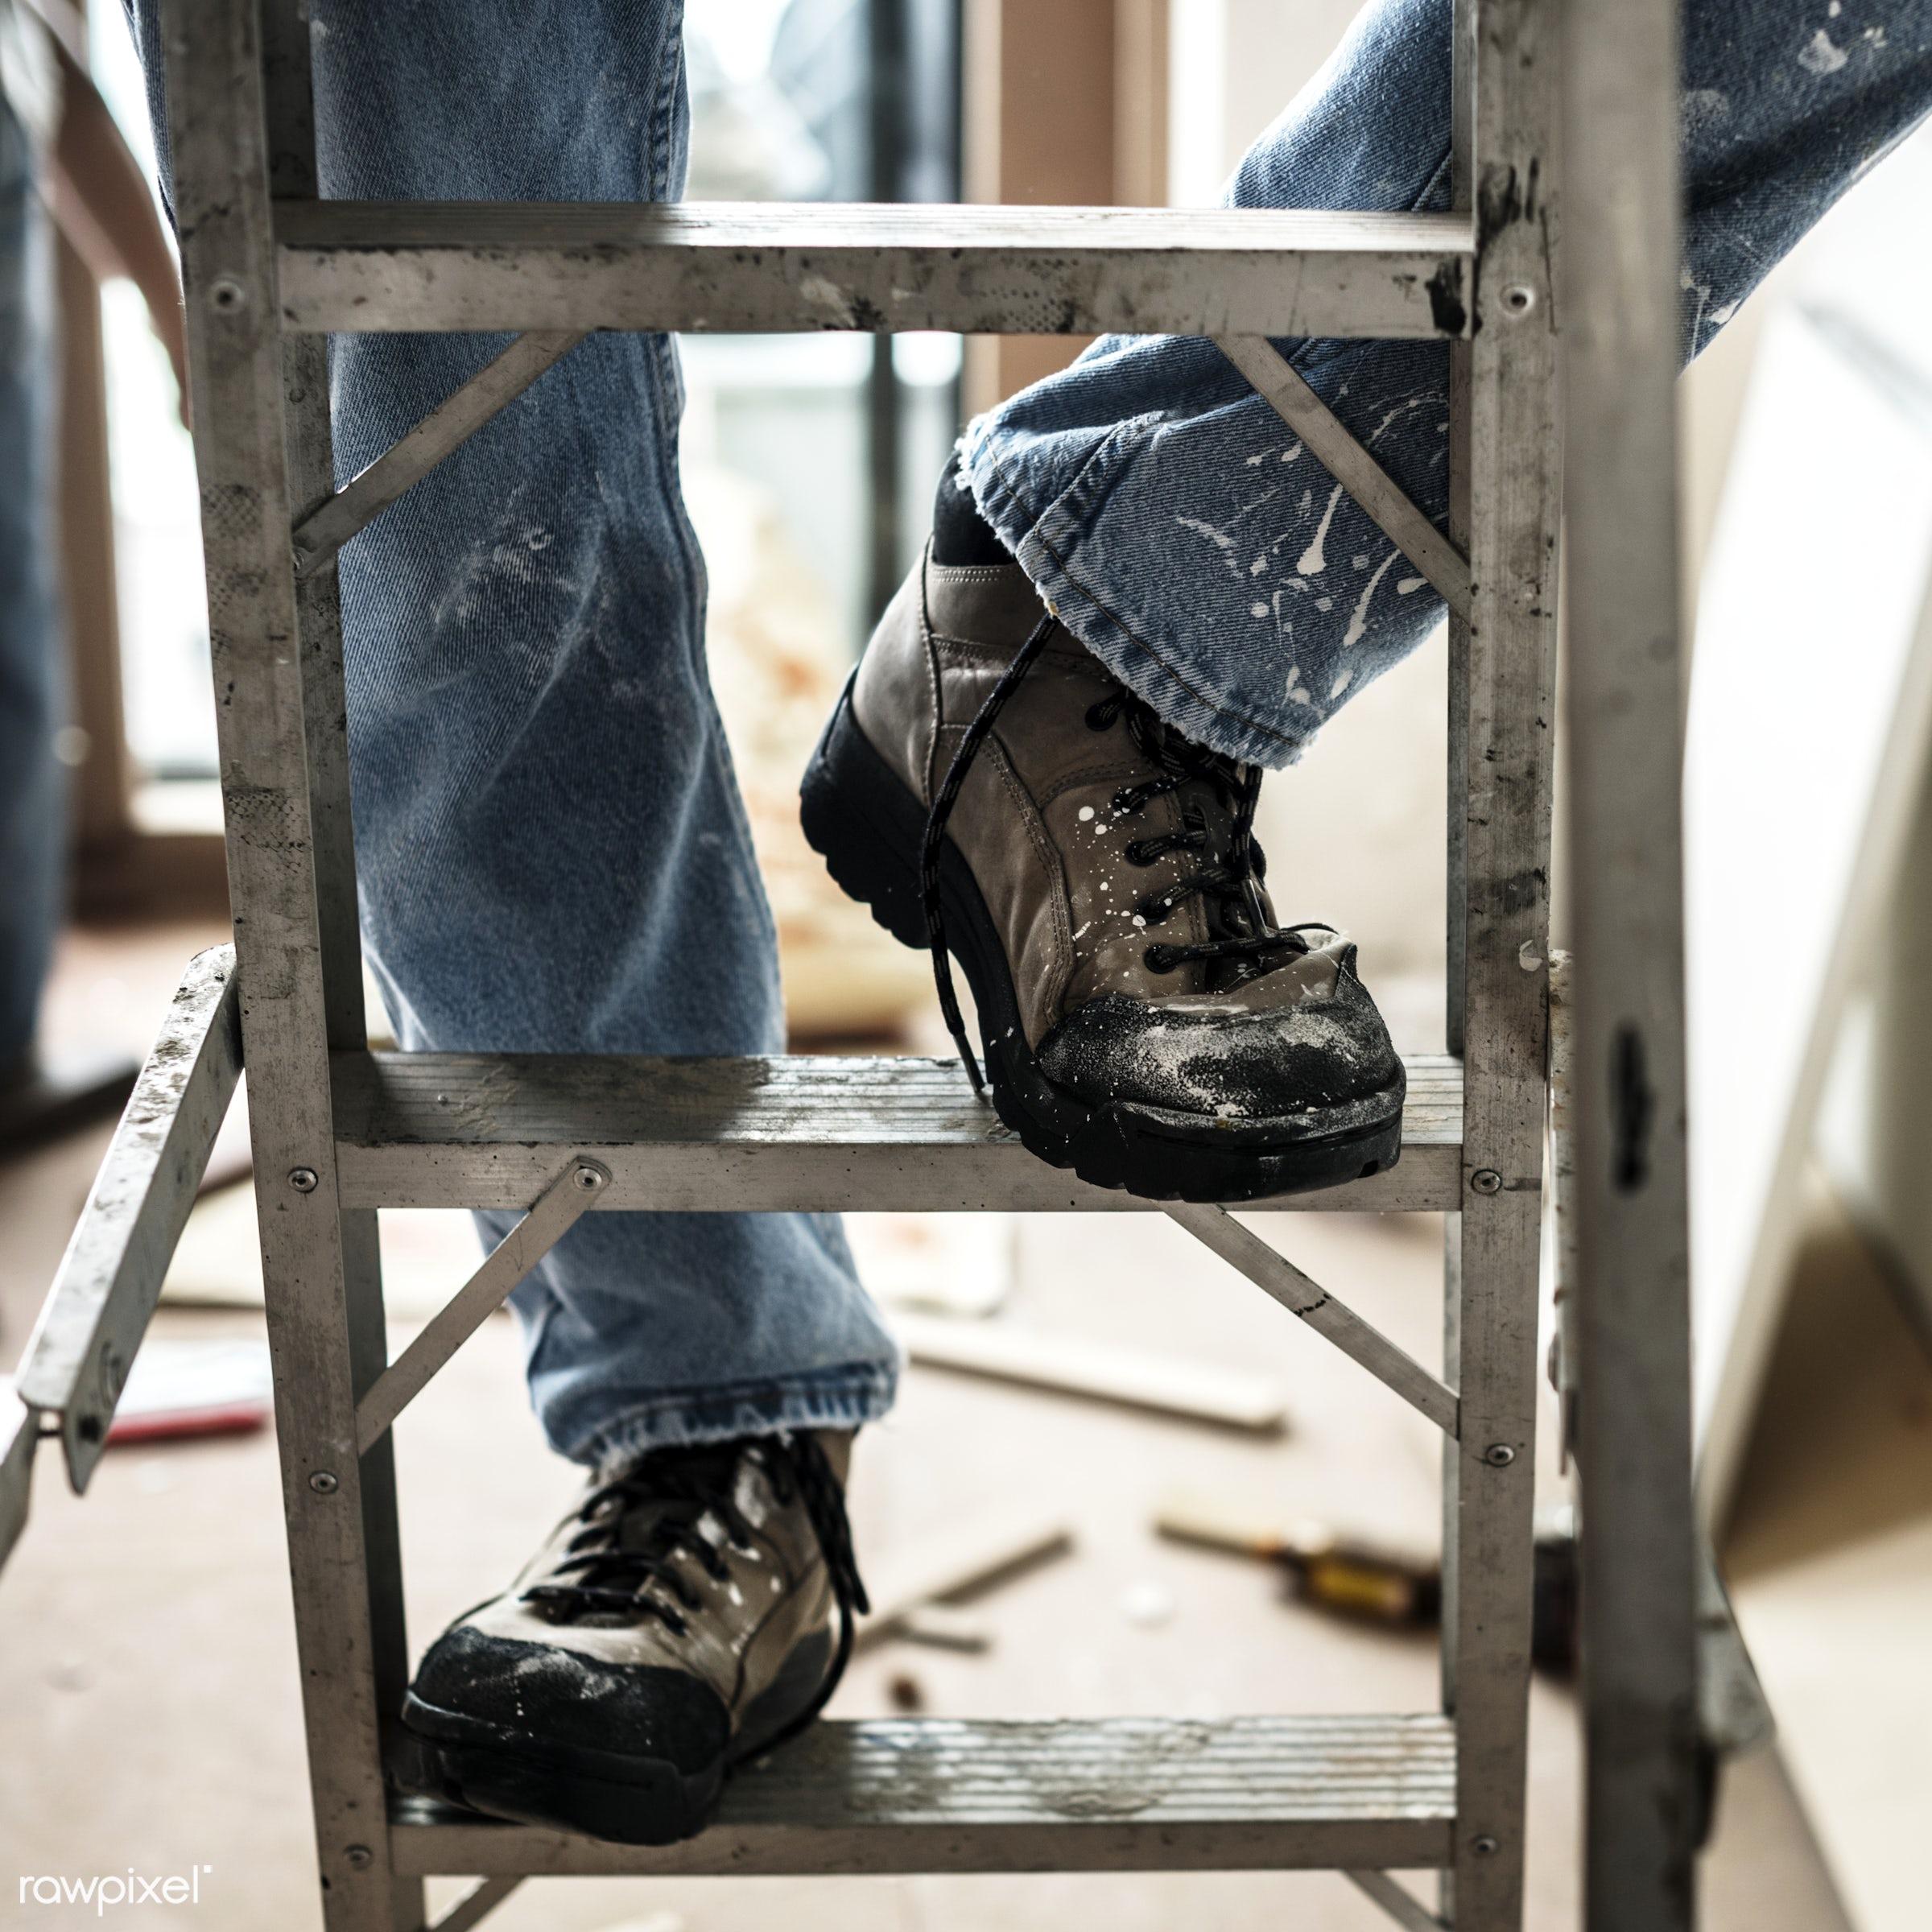 ladder, renovating, builder, equipment, build, tools, materials, craftsman, handyman, worker, laborer, repair, workman,...